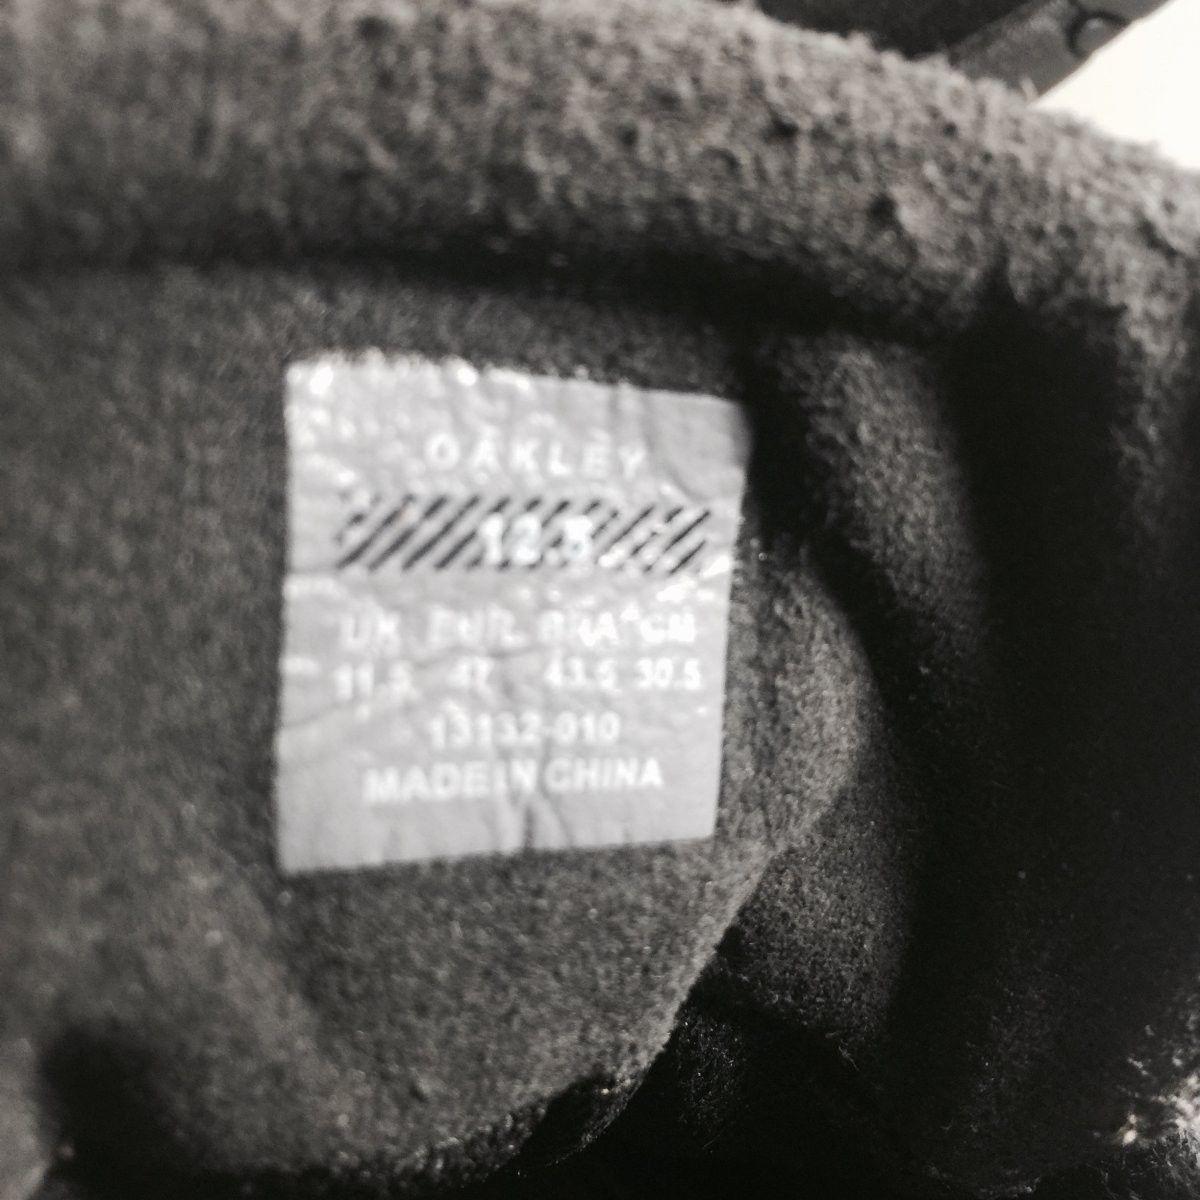 Oakley Shoes Size 12.5 Original Rip Cords Black/Chrome - Oakley Rip Cord Black Chrome (6).jpg